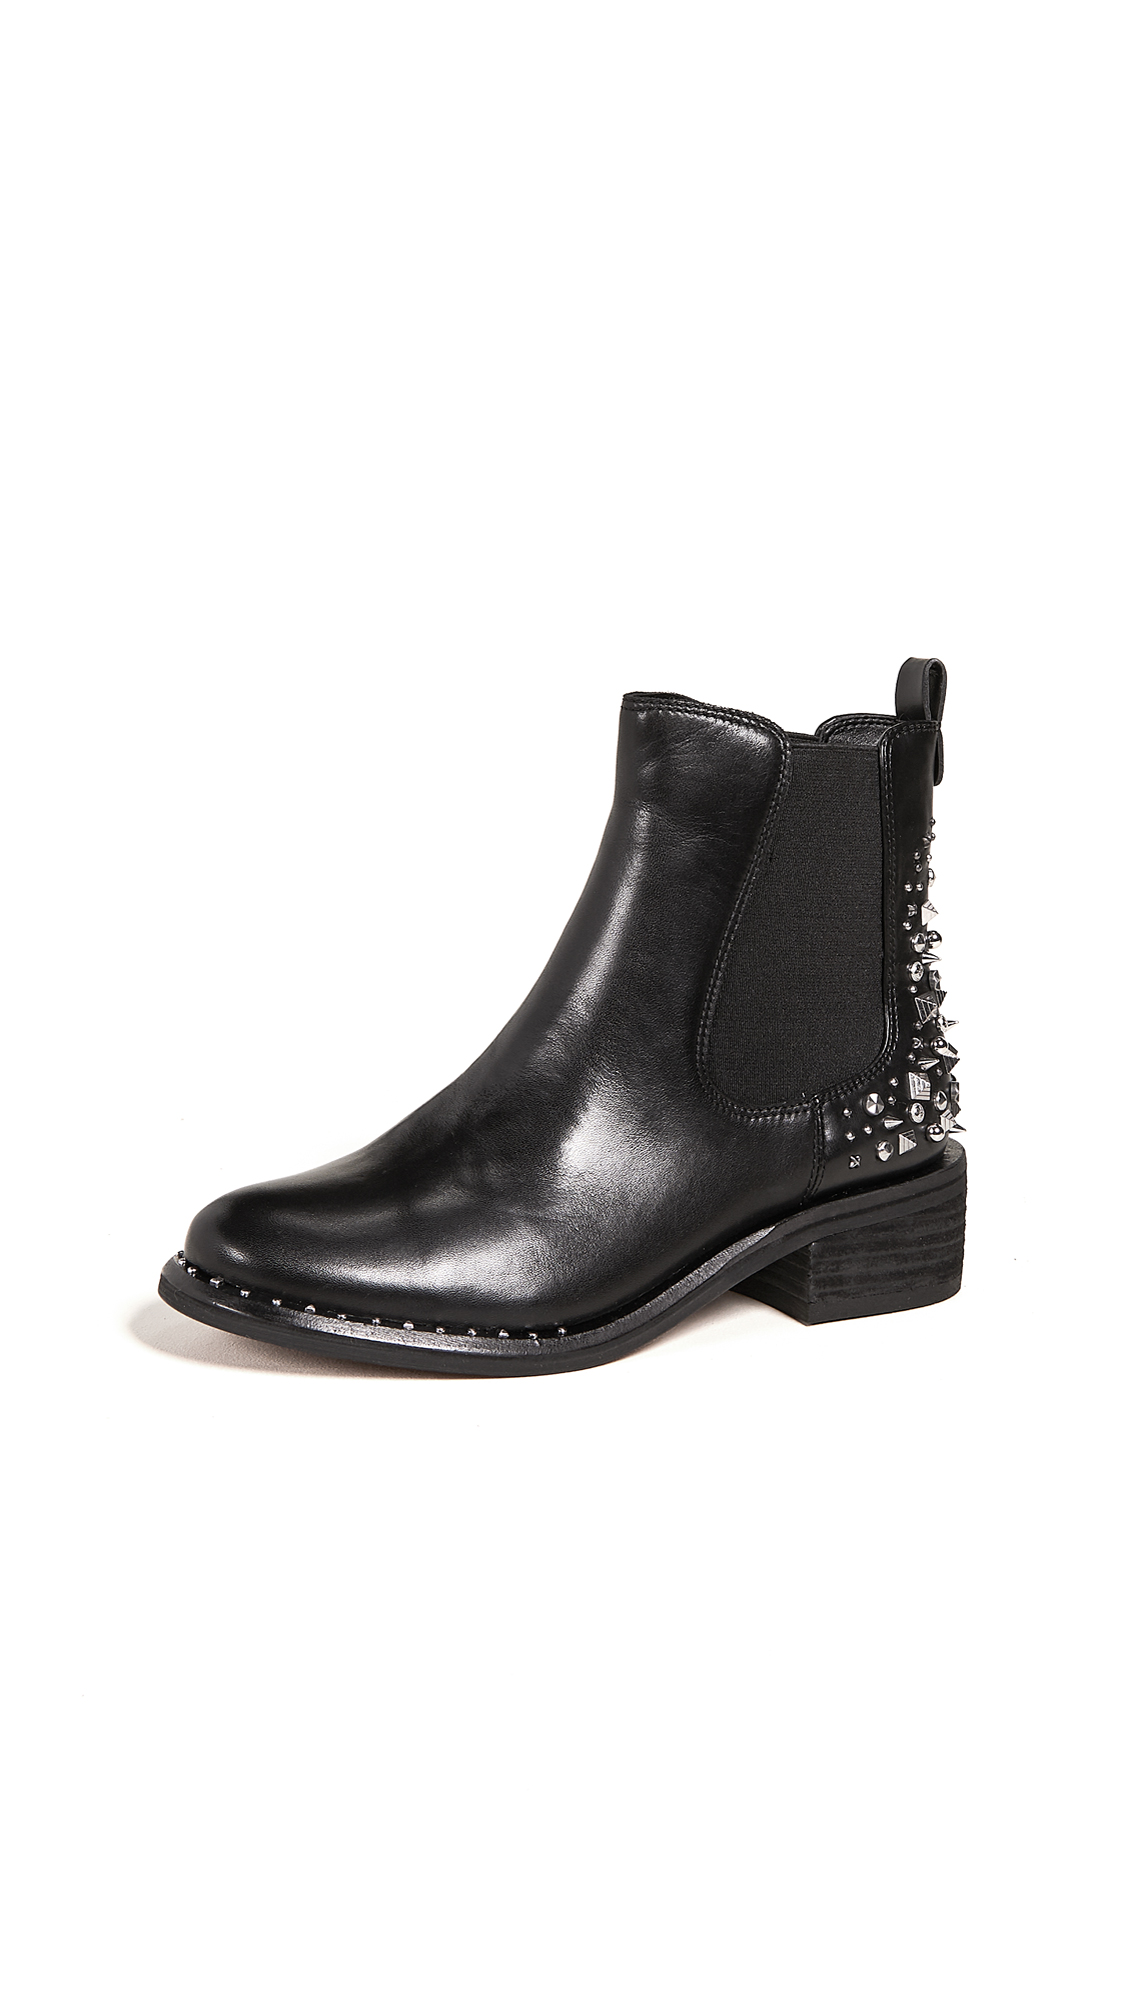 Sam Edelman Dover Chelsea Boots - Black